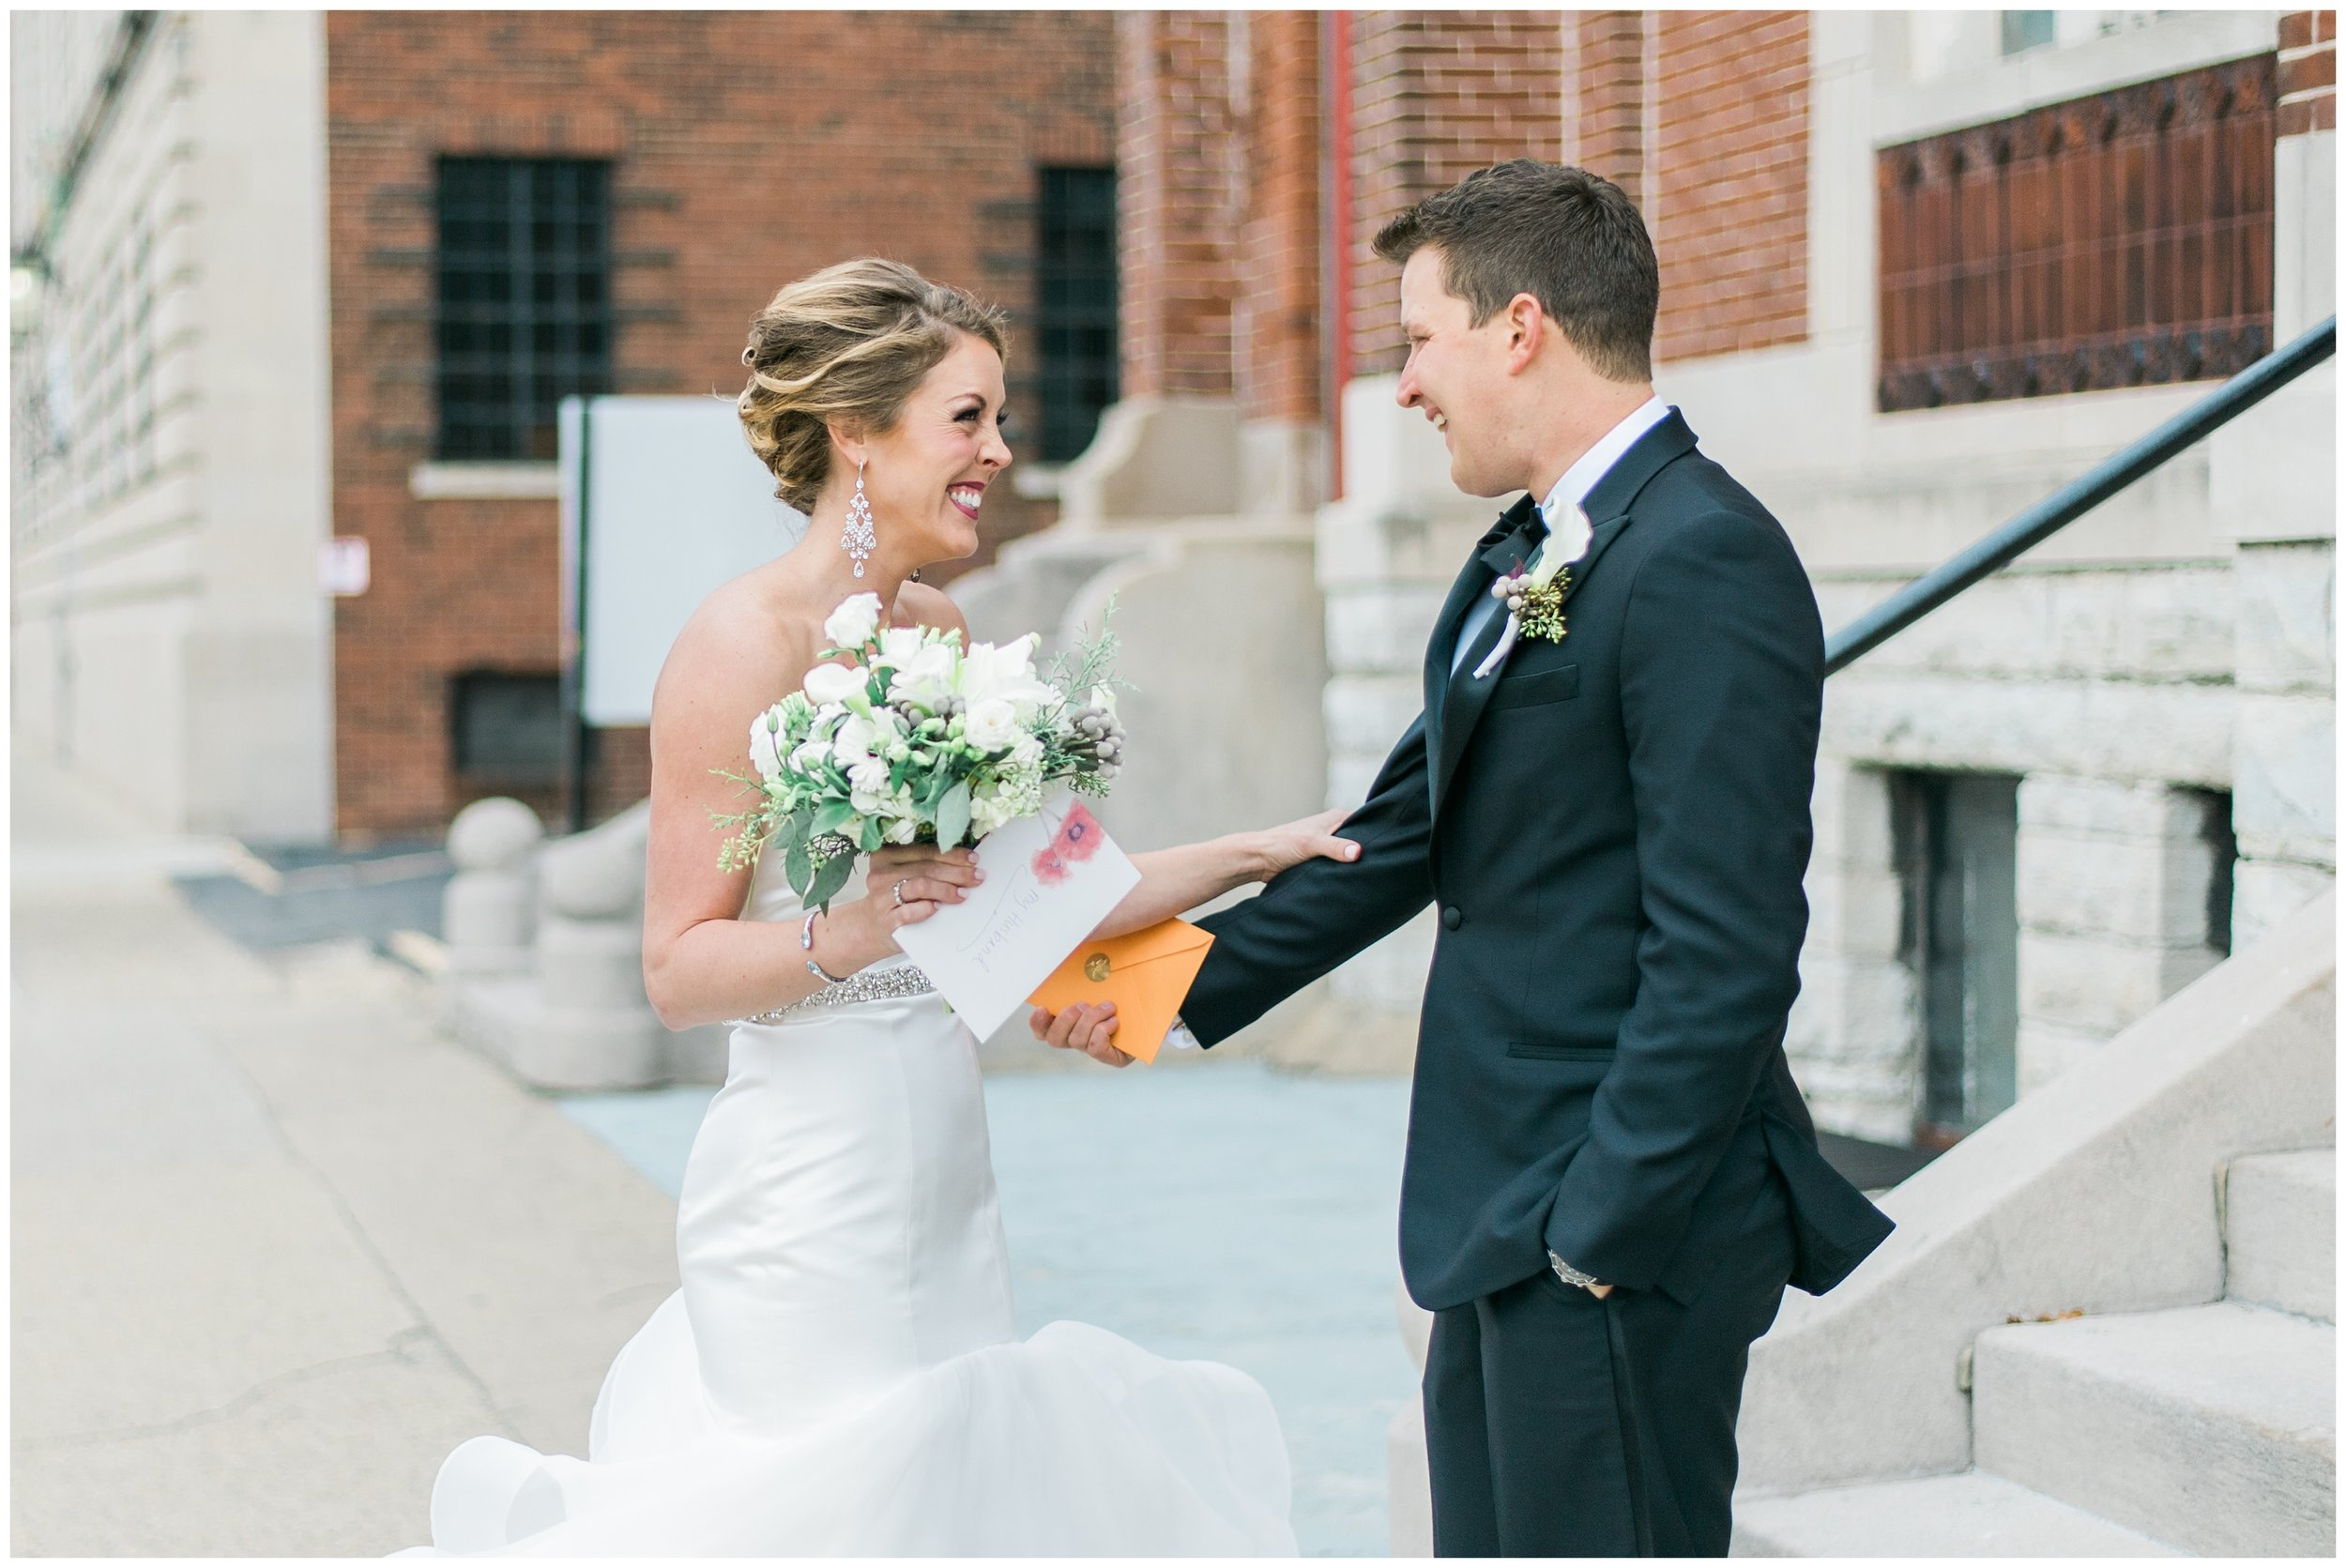 Rebecca_Bridges_Photography_Indianapolis_Wedding_Photographer_5793.jpg